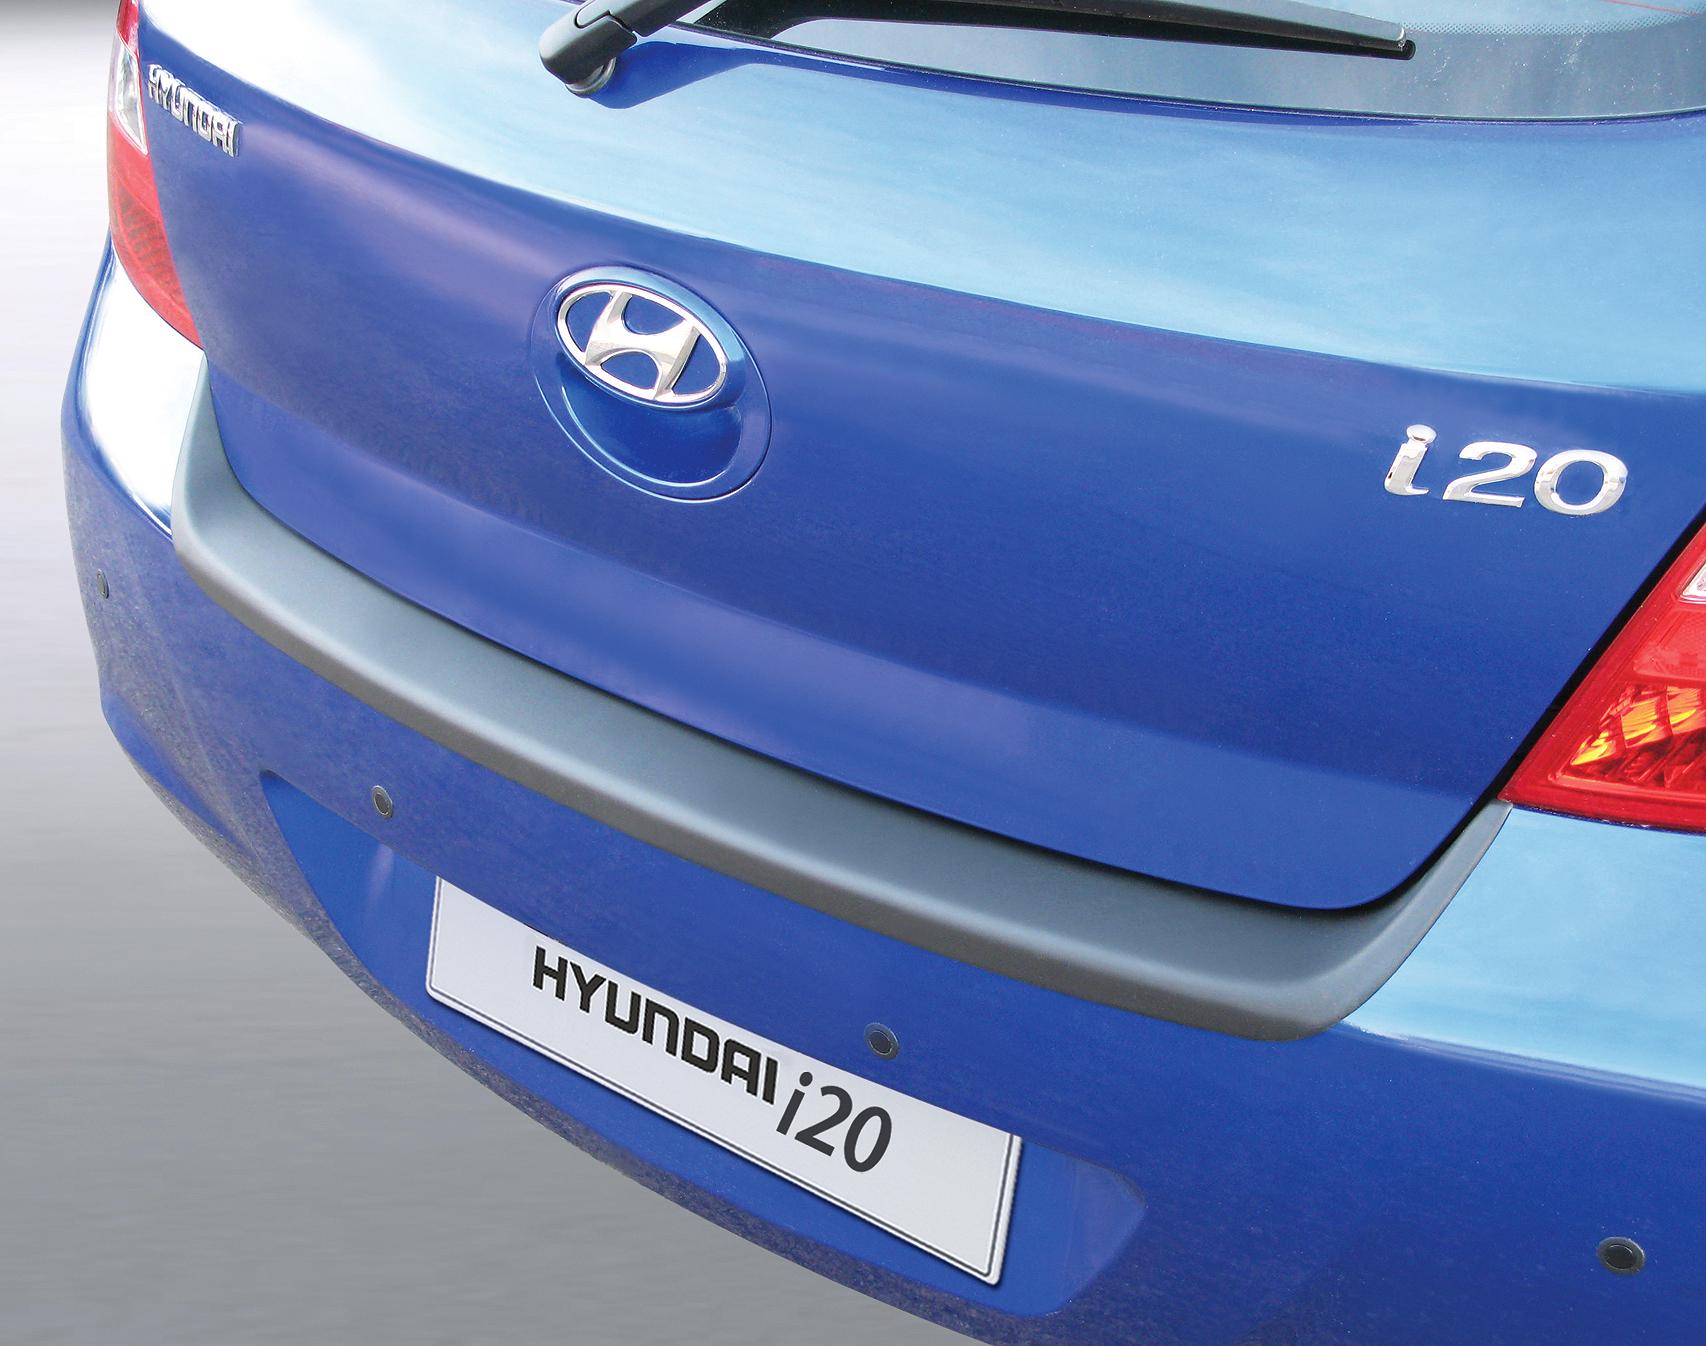 Takapuskurin kolhusuoja Hyundai i20 2009-2012